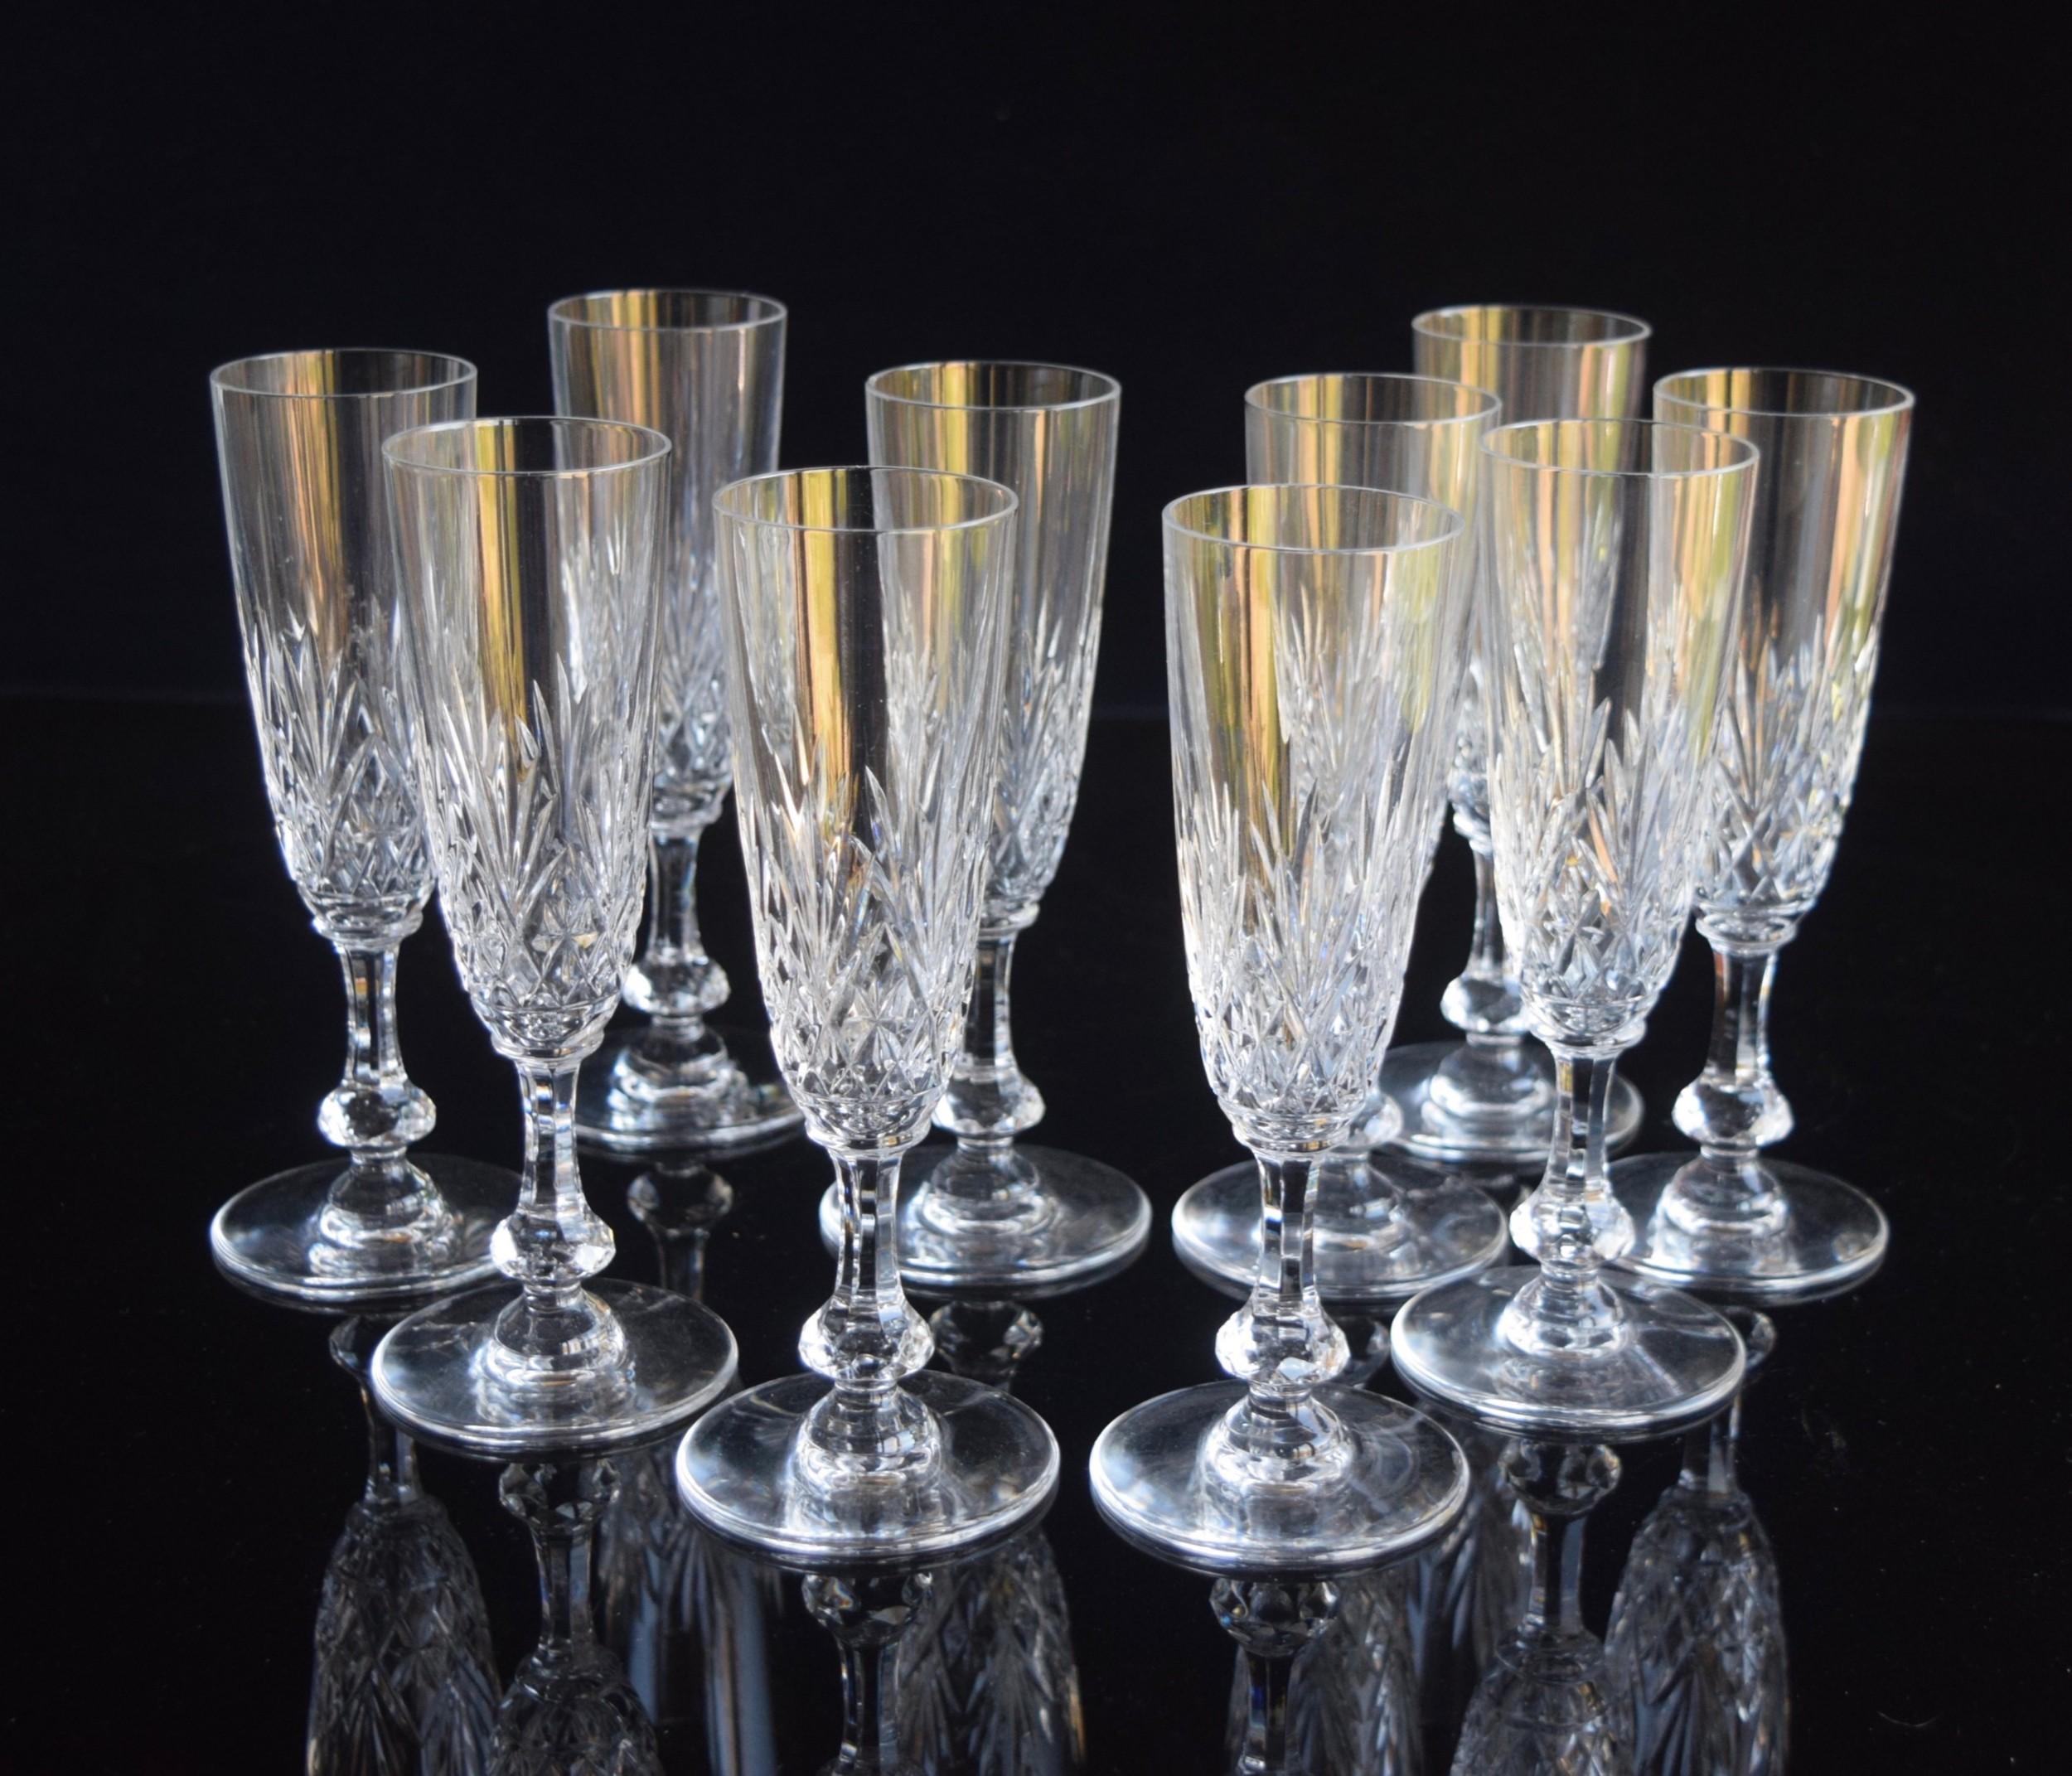 10 st louis crystal massenet champagne flutes